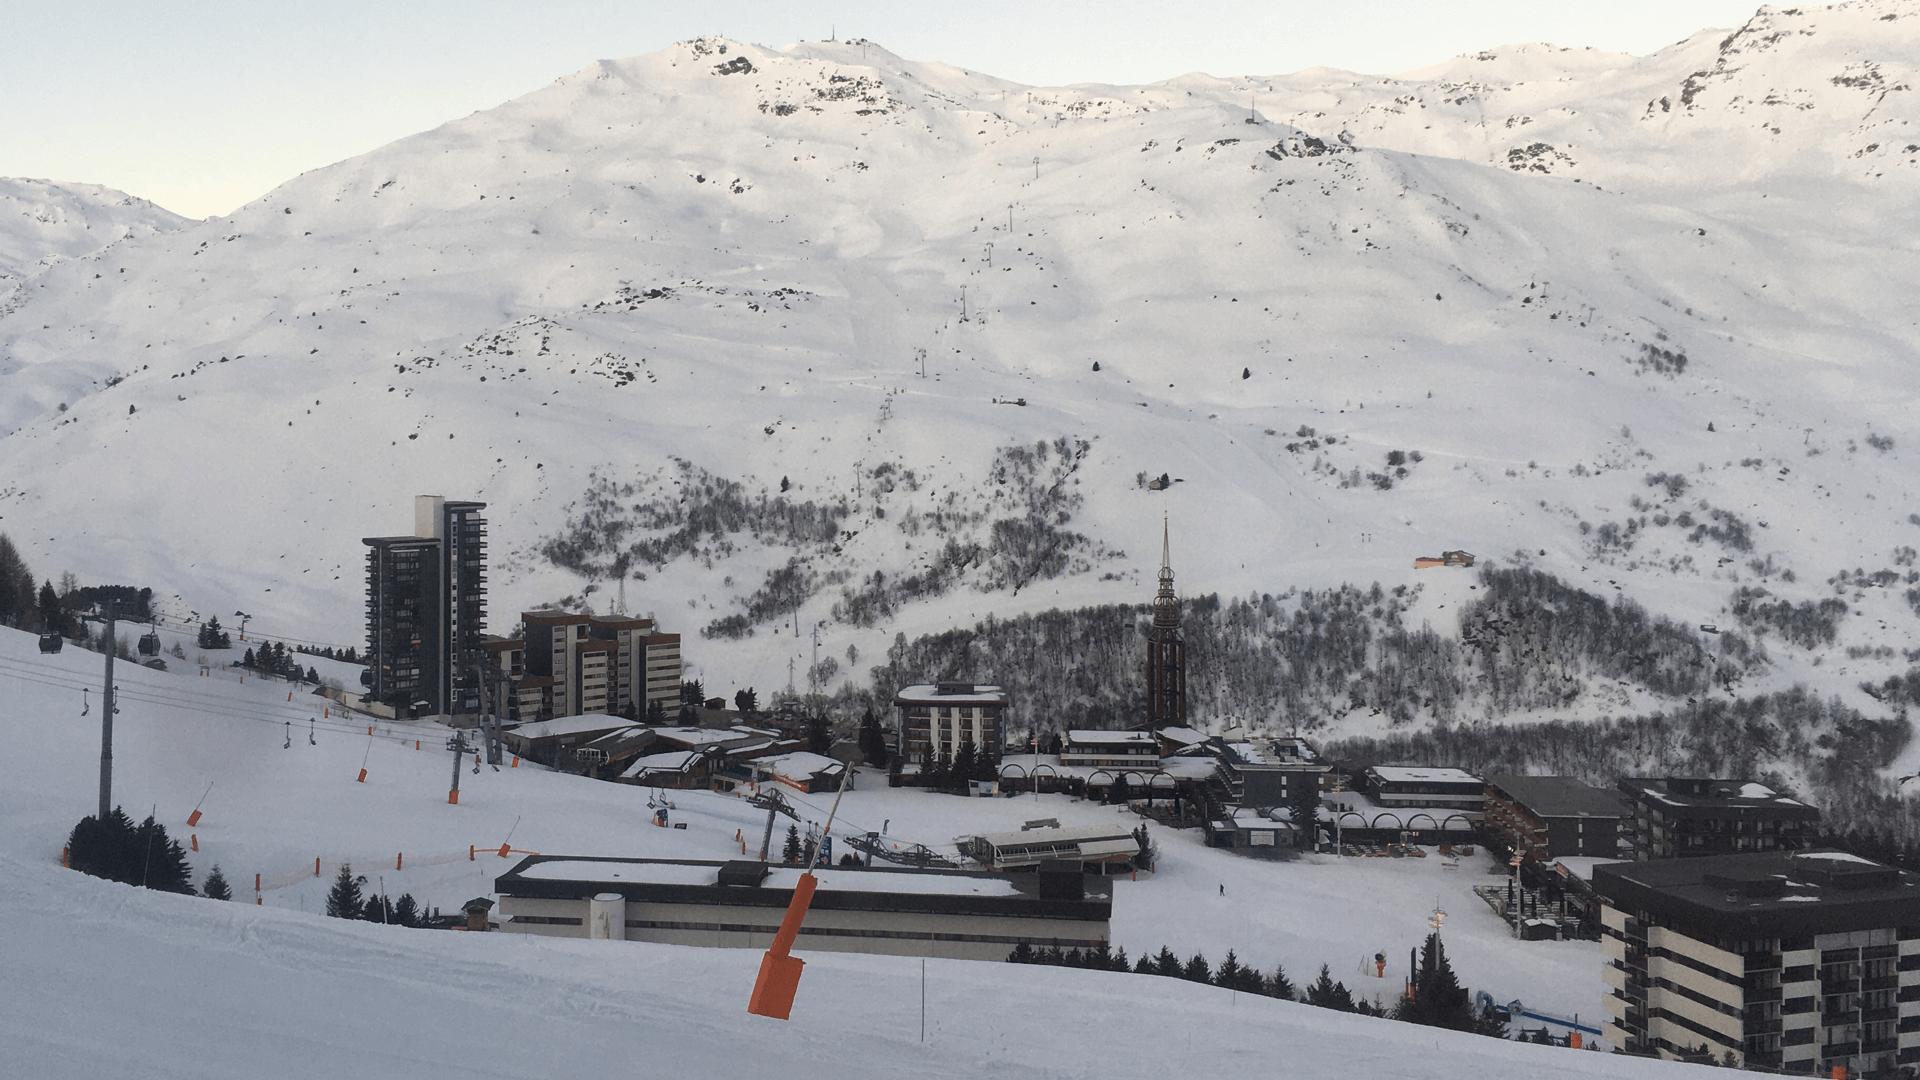 mat_kat_snowy slopes landscape in Les Menuires, France